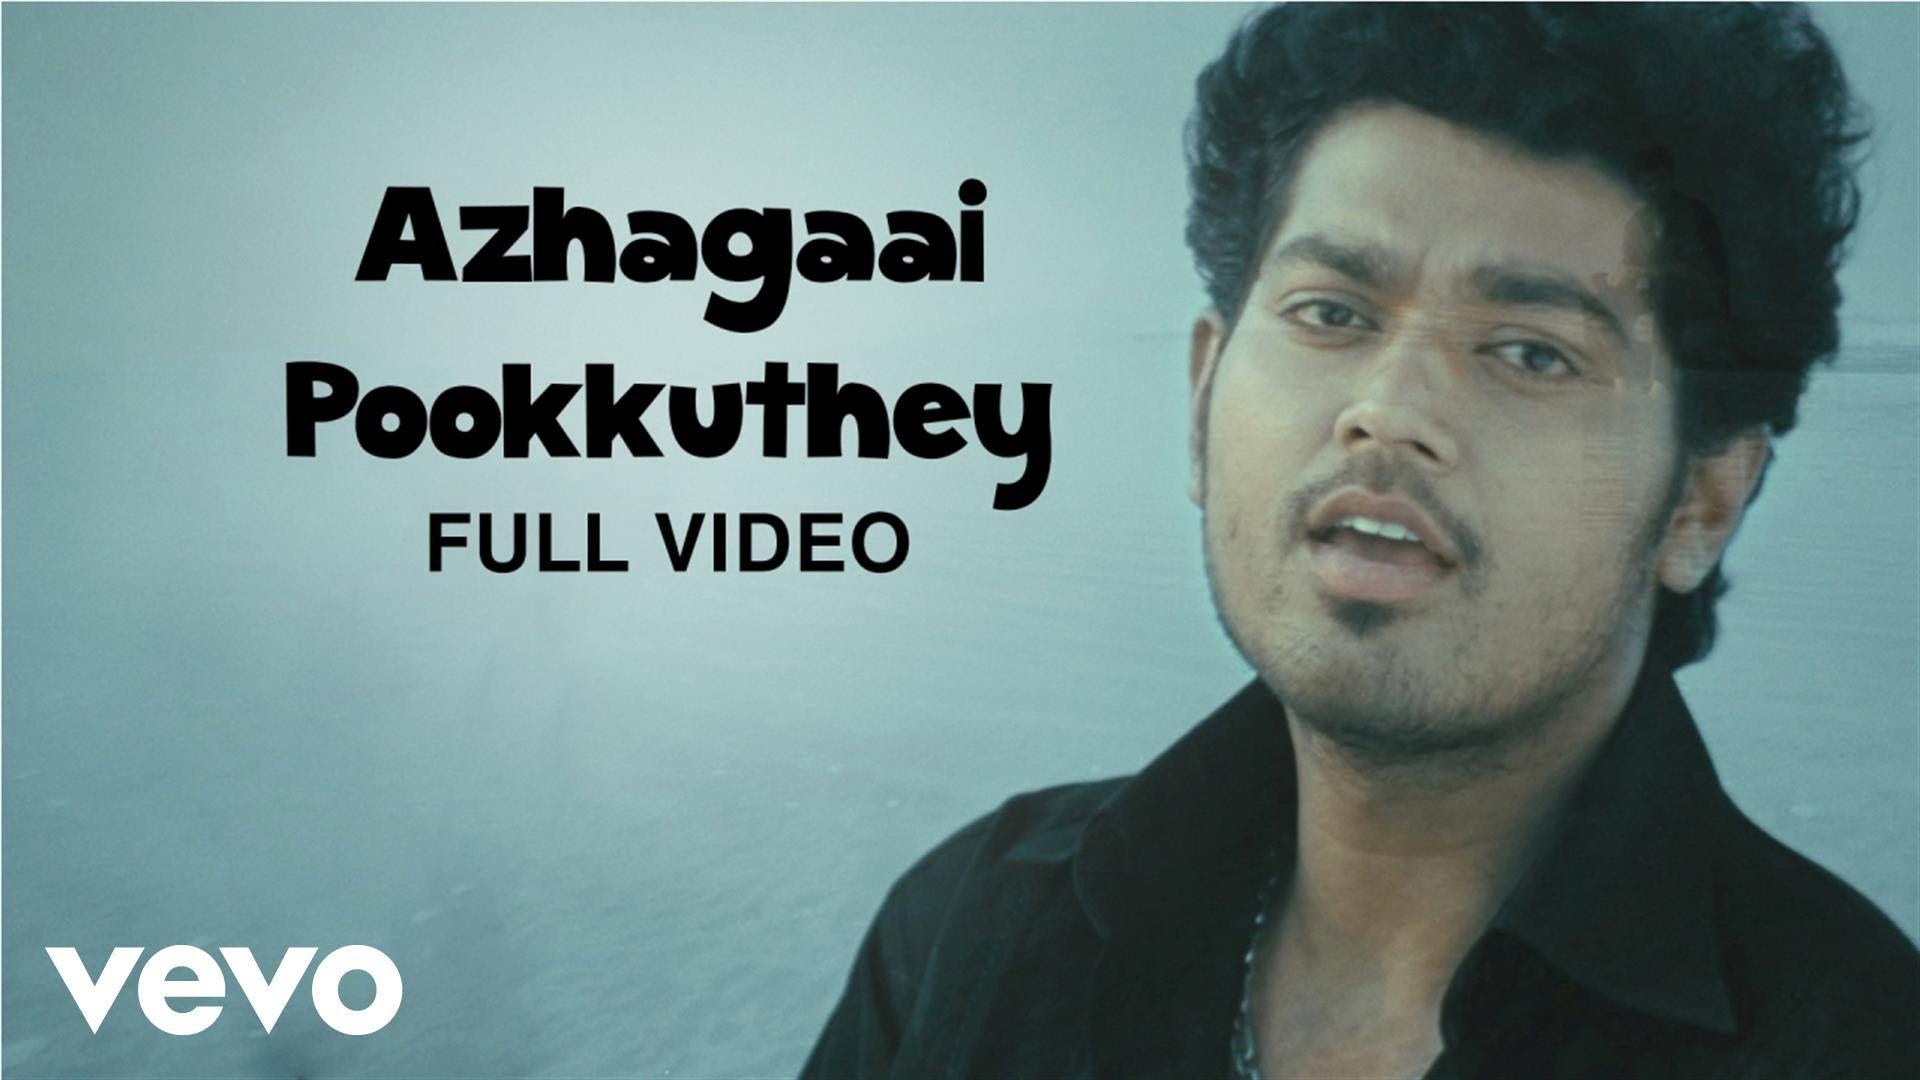 Ninaithale Inikkum Azhagaai Pookkuthey Video Vijay Antony Songs Antony Music Songs